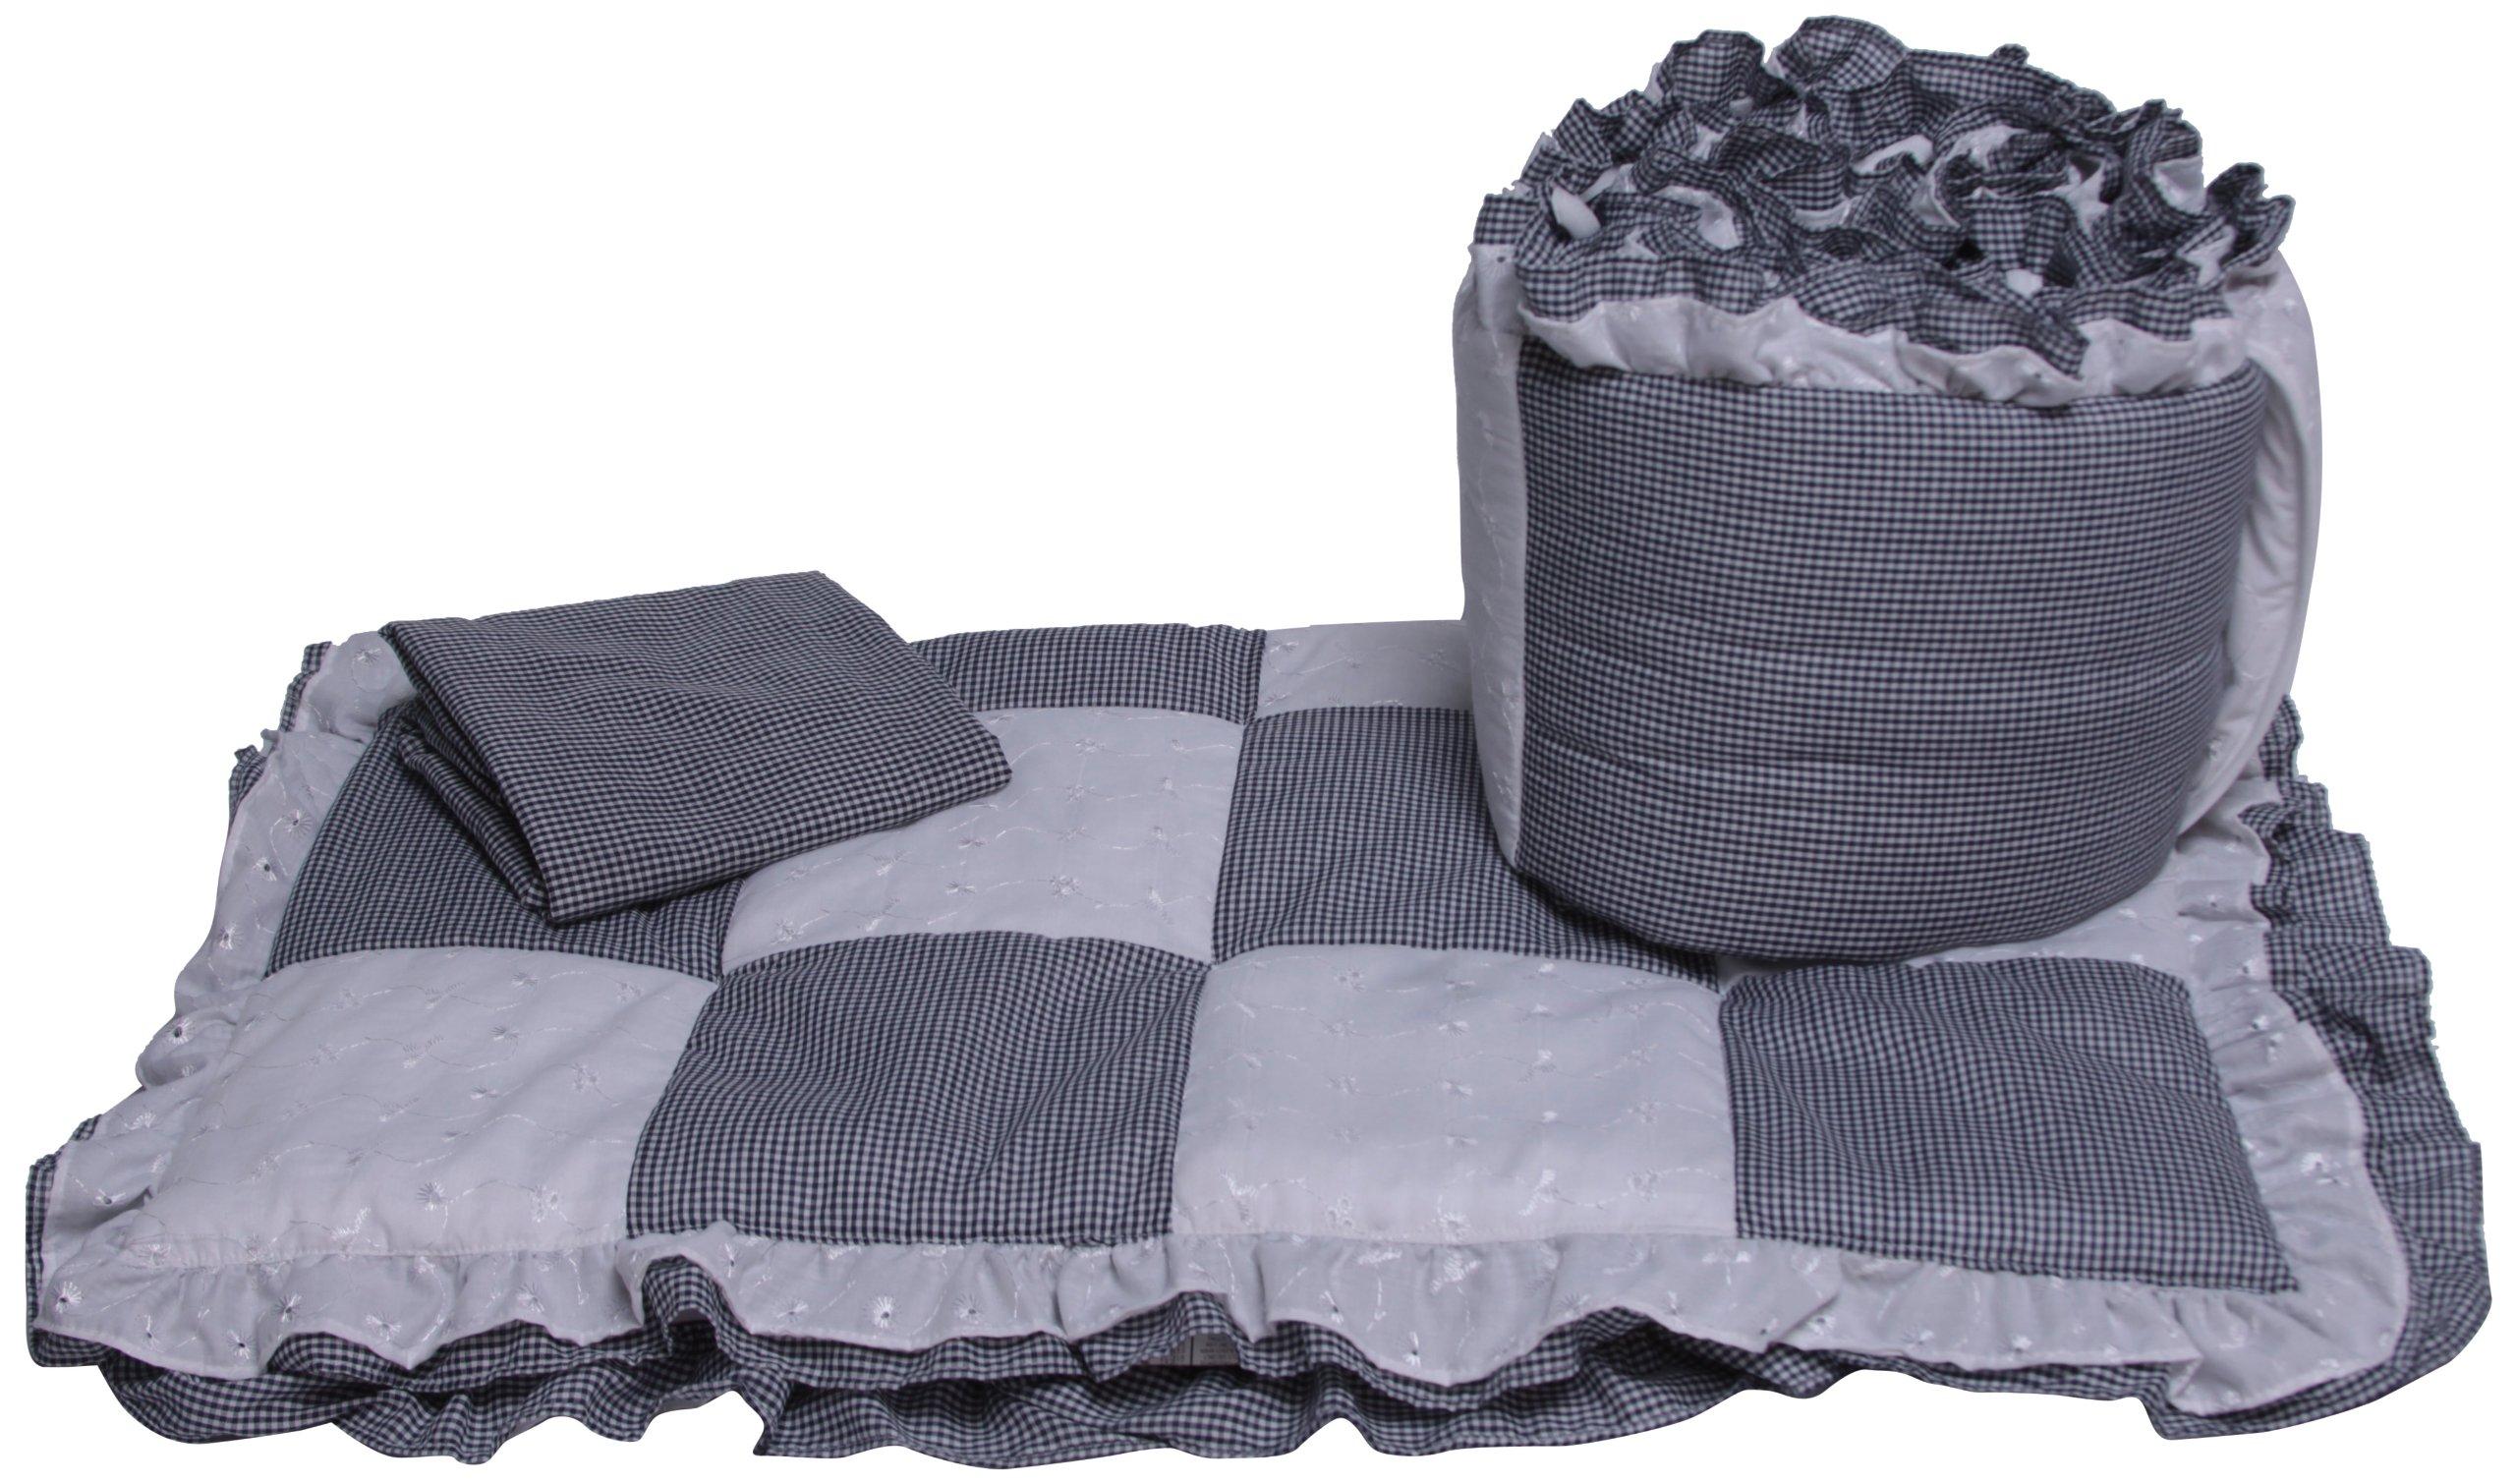 Baby Doll Bedding Gingham Cradle Bedding Set, Navy by BabyDoll Bedding